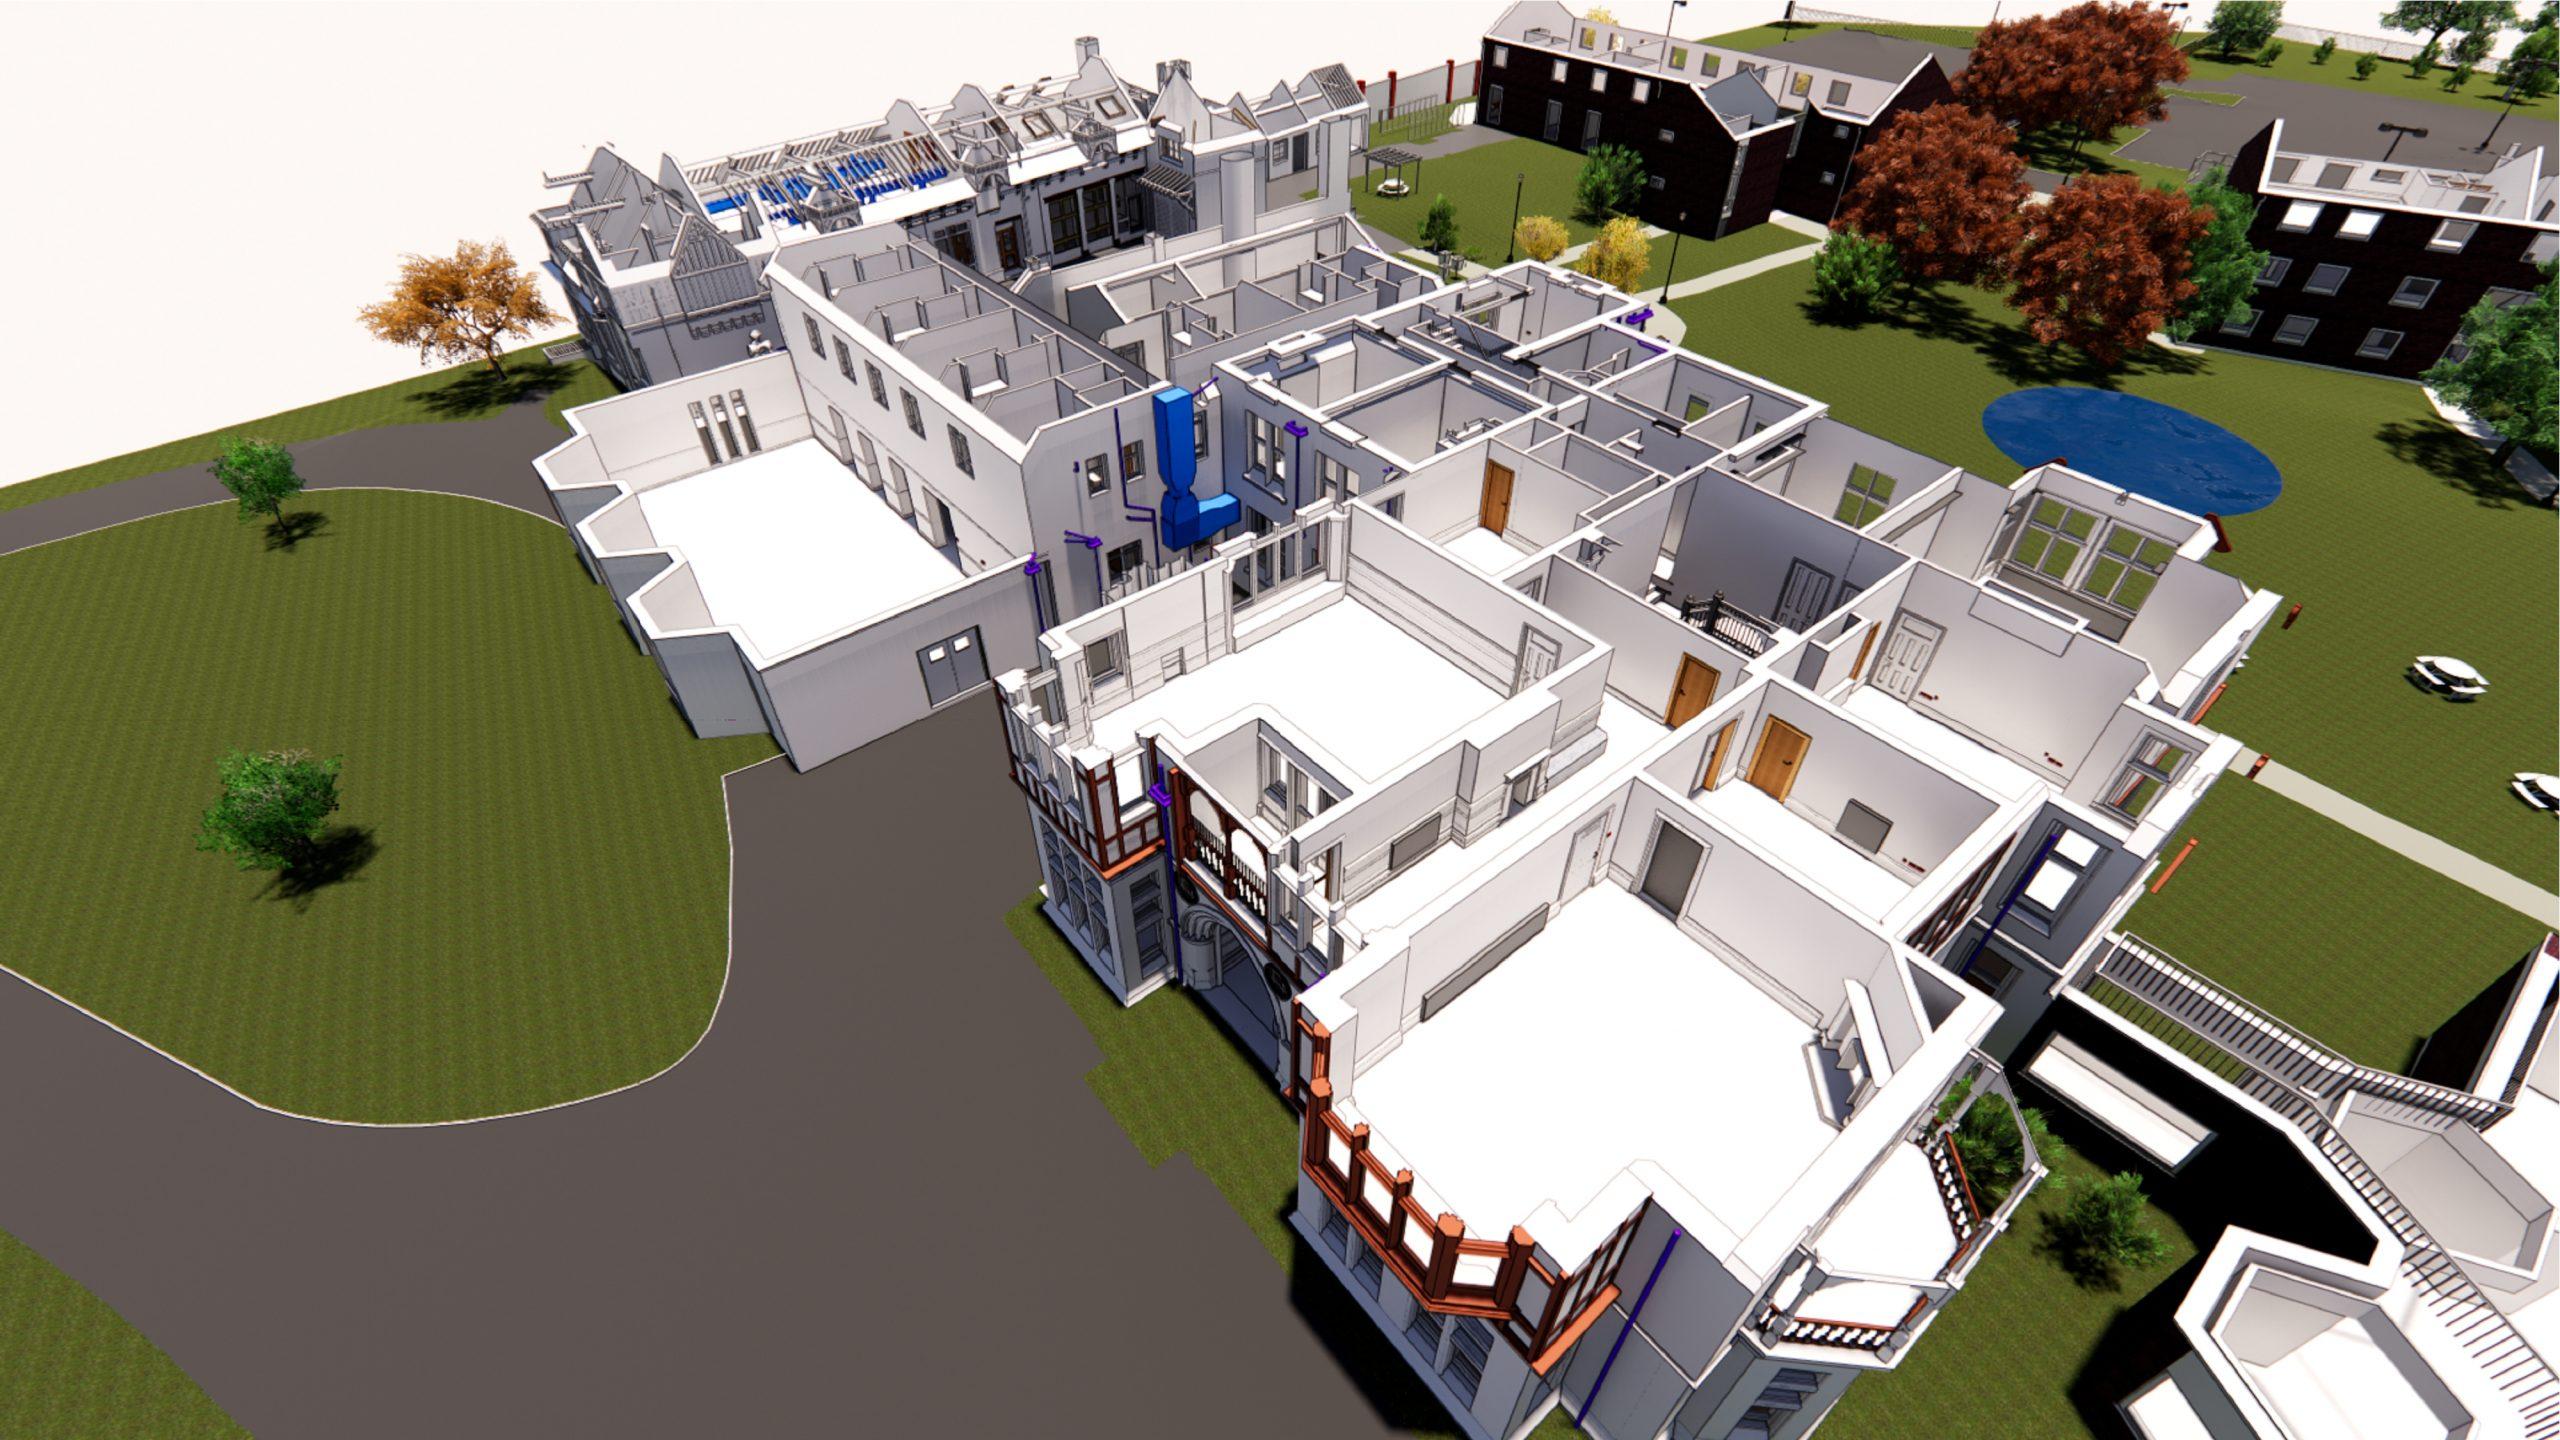 Leicester University, Rendering 3D